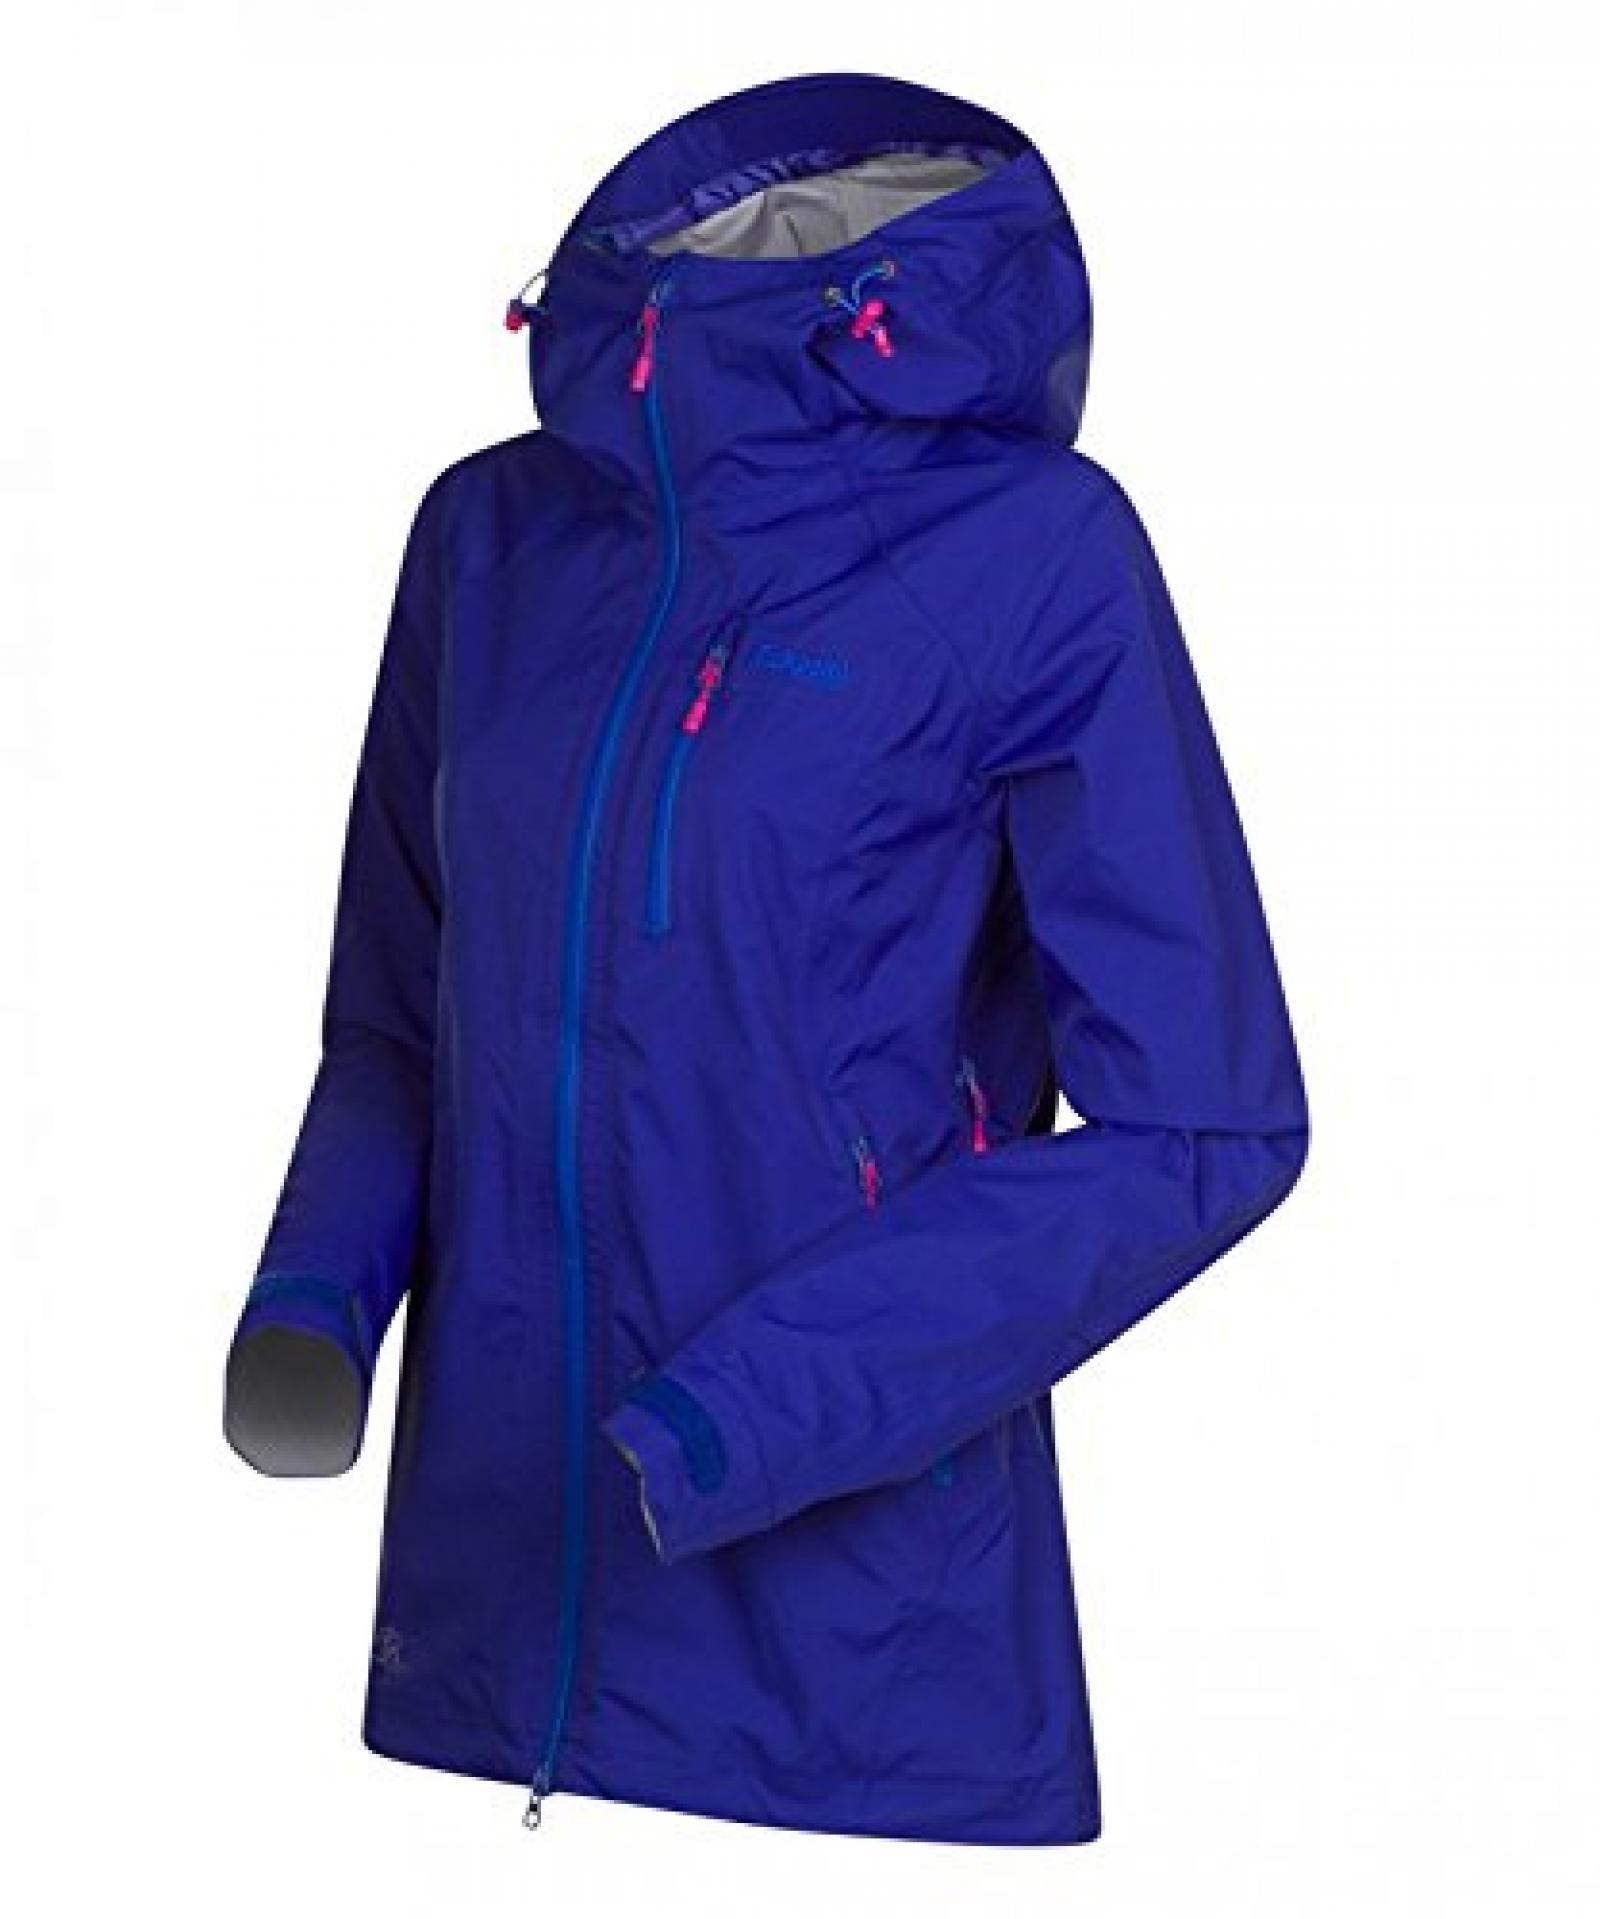 Bergans Outdoorjacke Eidfjord Lady Jacket - wasserdicht